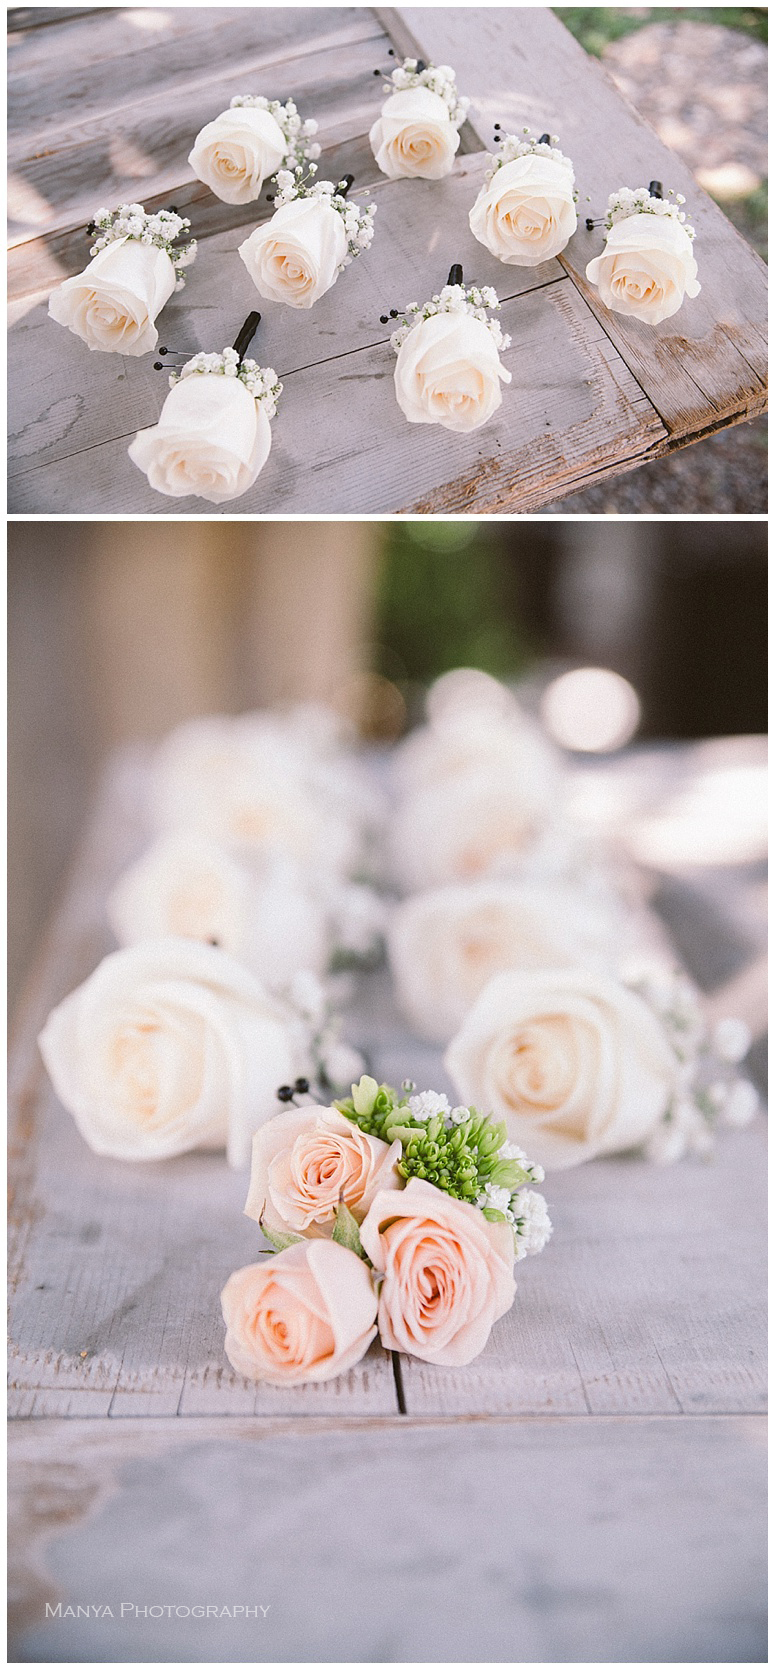 2014-09-04_0001 - Josh and Jaquelynn | Wedding | San Juan Capistrano | Southern California Wedding Photographer | Manya Photography